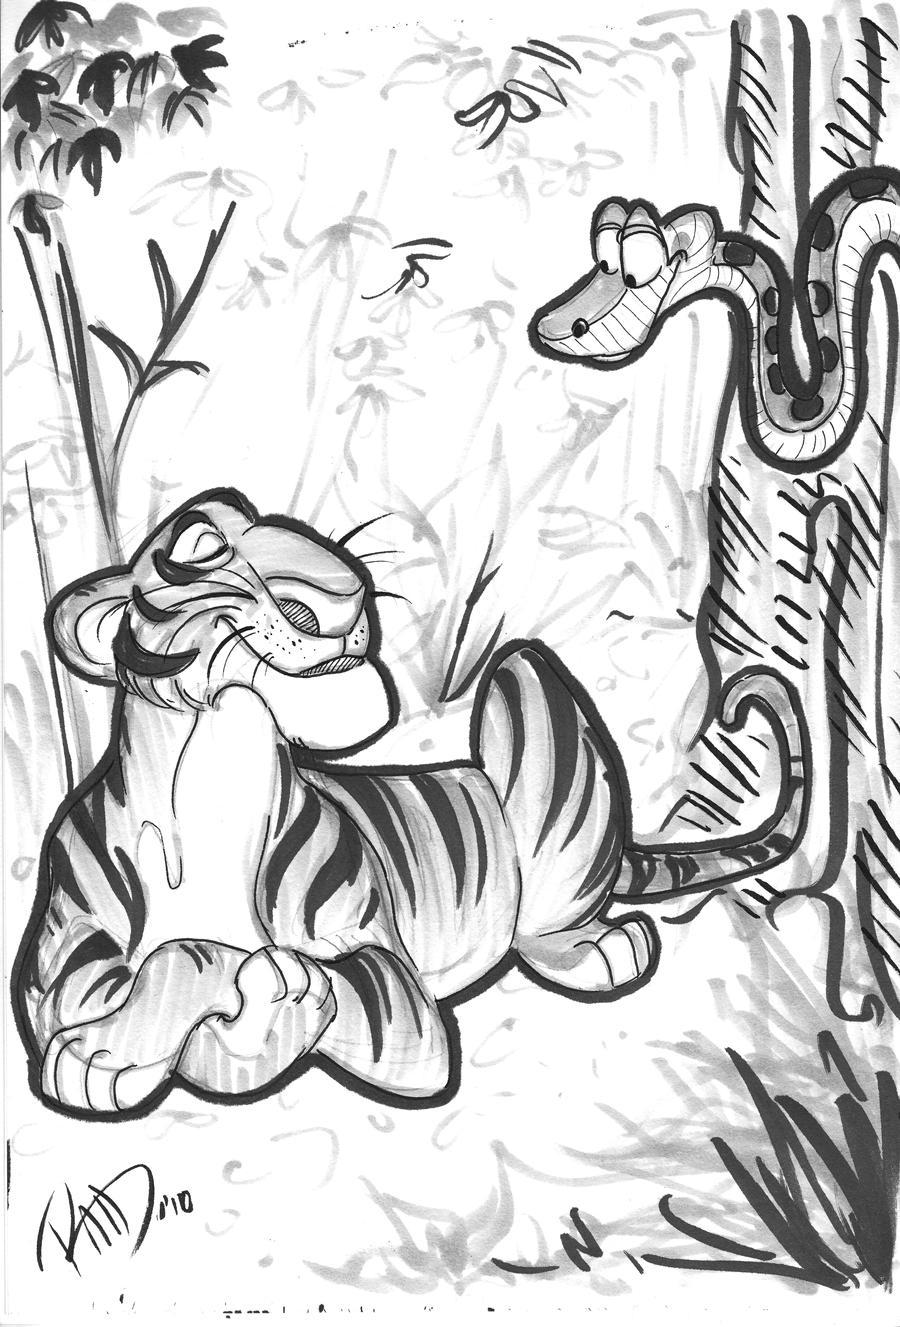 Jungle Book Sketch By Albell On DeviantArt